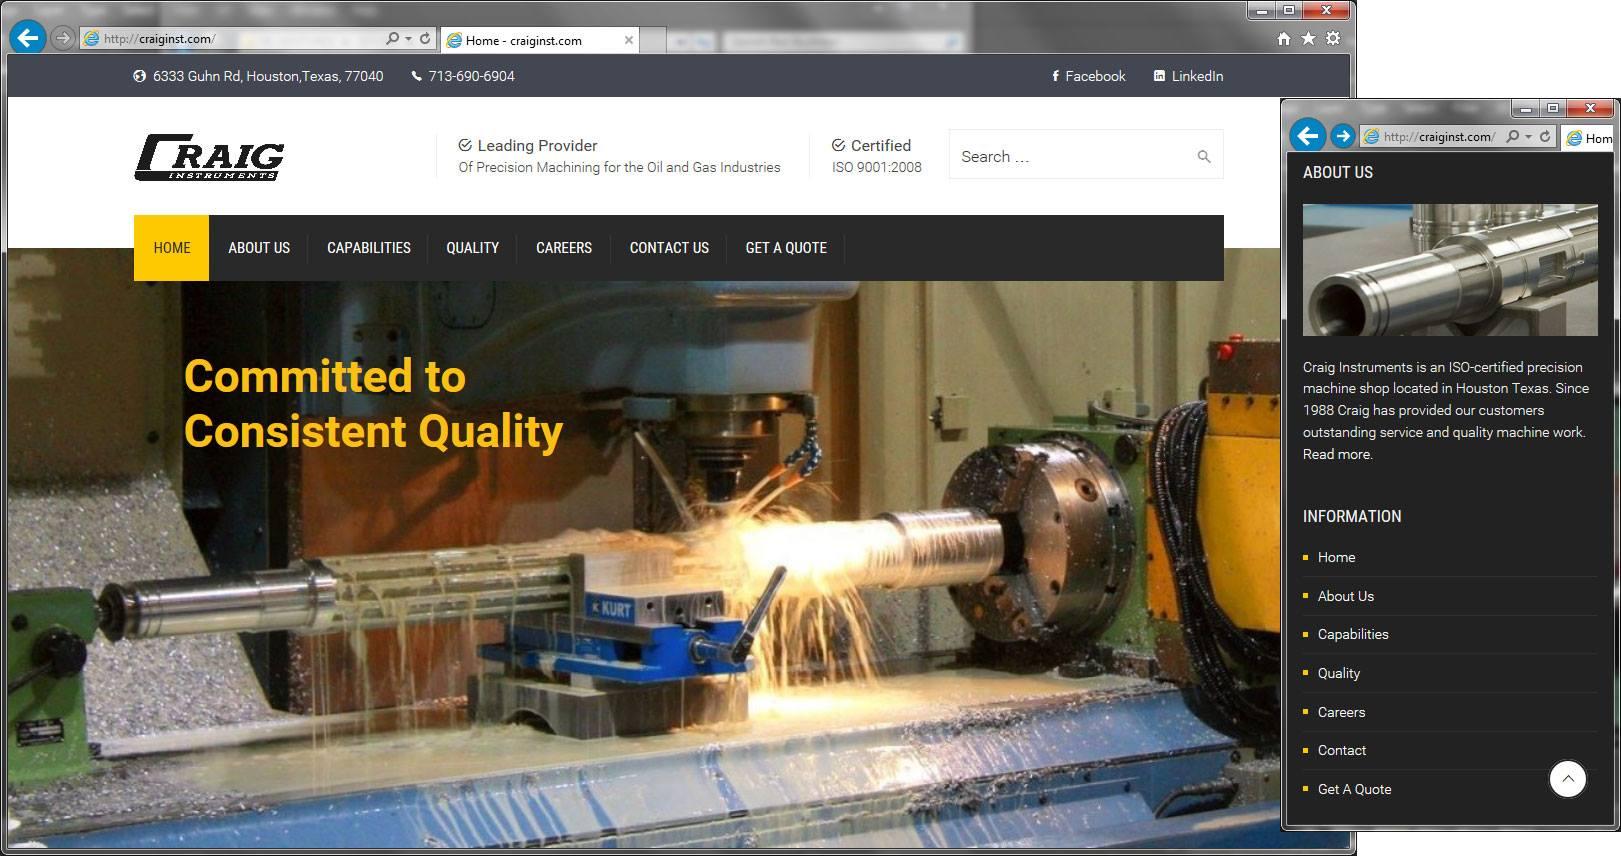 website-design-services-oc45.jpg